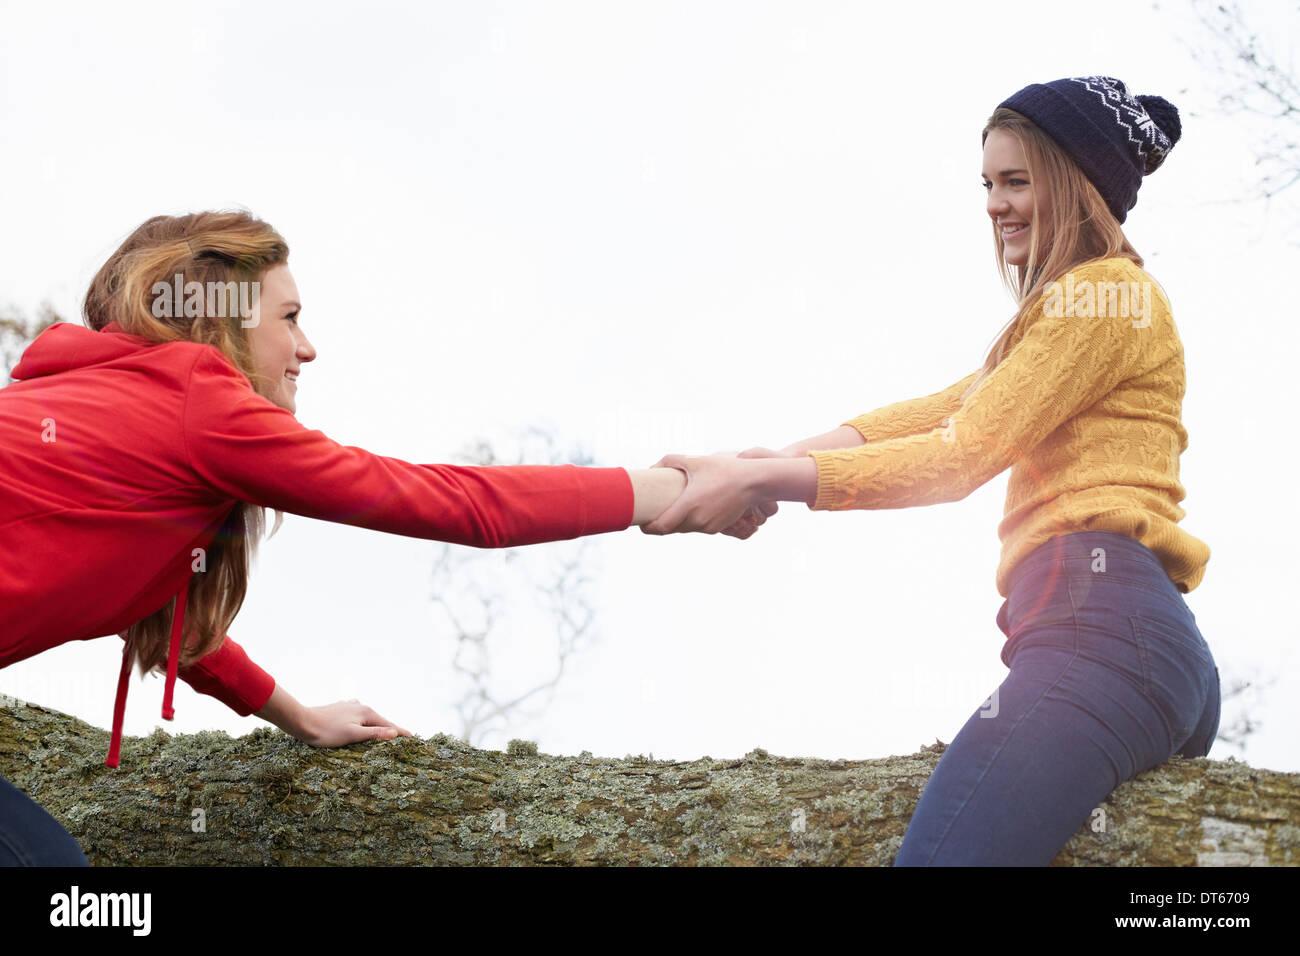 Teenage girls play fighting on tree trunk - Stock Image